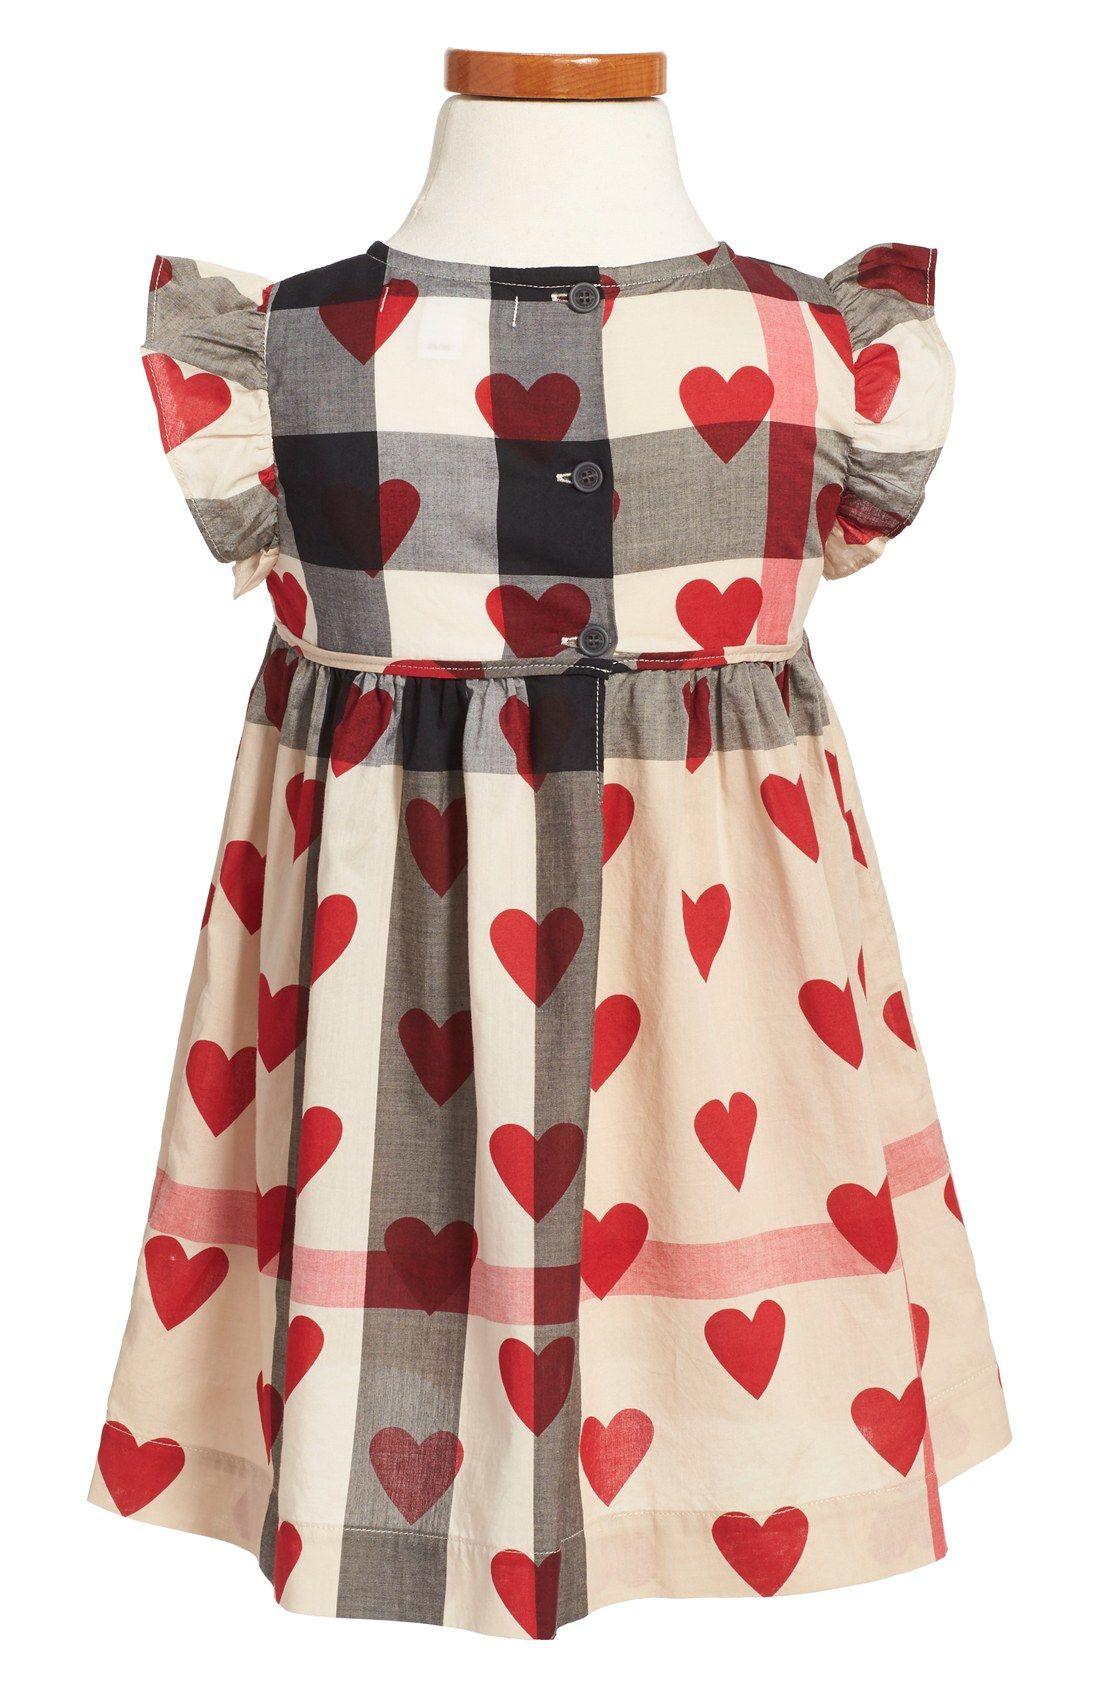 fe7d951a71 Burberry  Amanda  Check   Heart Print Cotton Voile Dress (Toddler Girls)